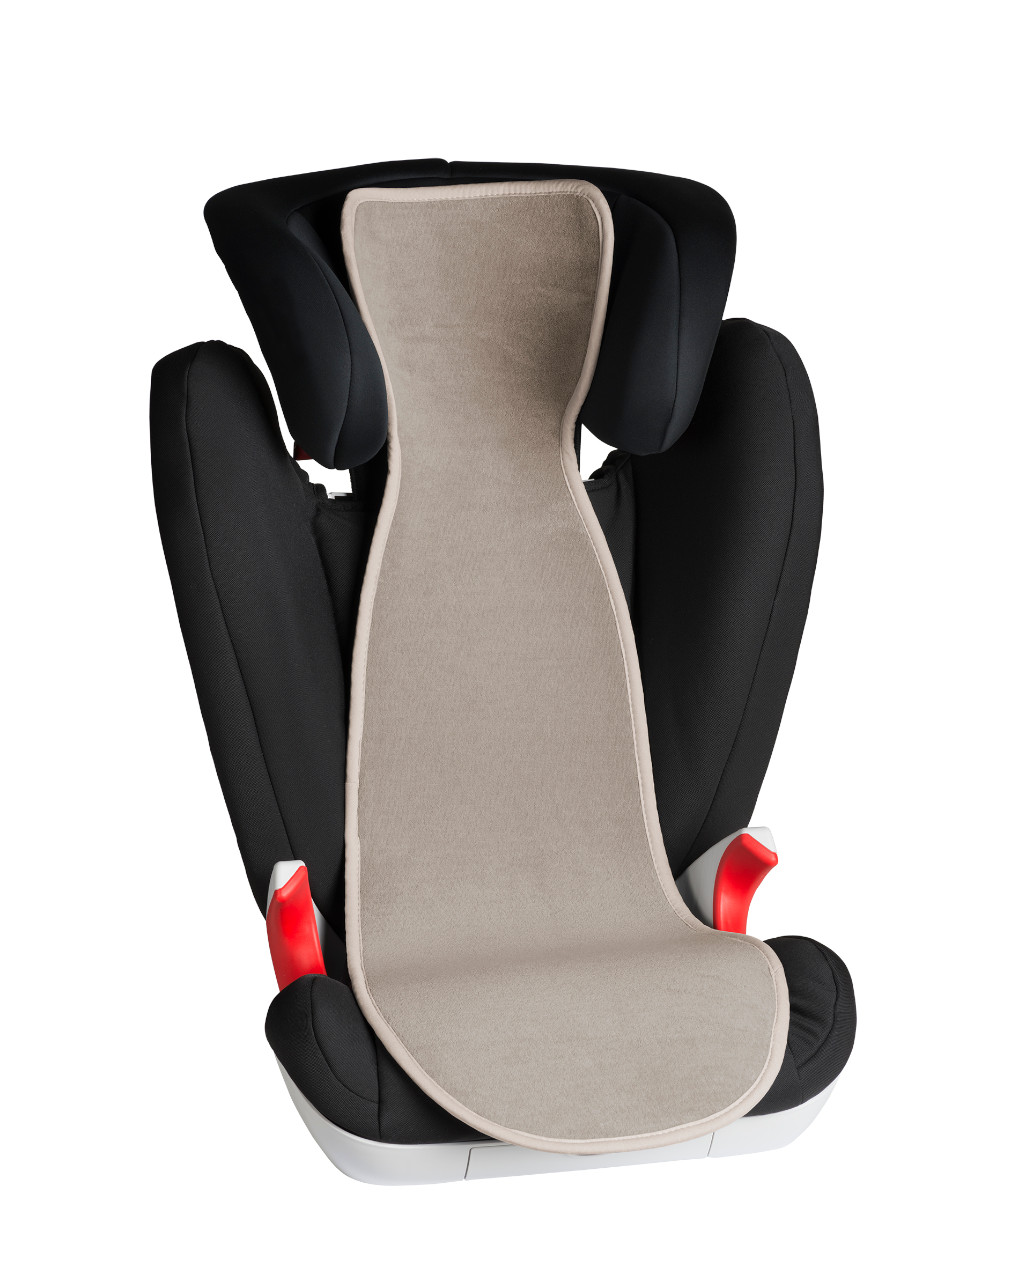 Cool seat foderina gruppo 2/3 aircuddle sabbia - AirCuddle